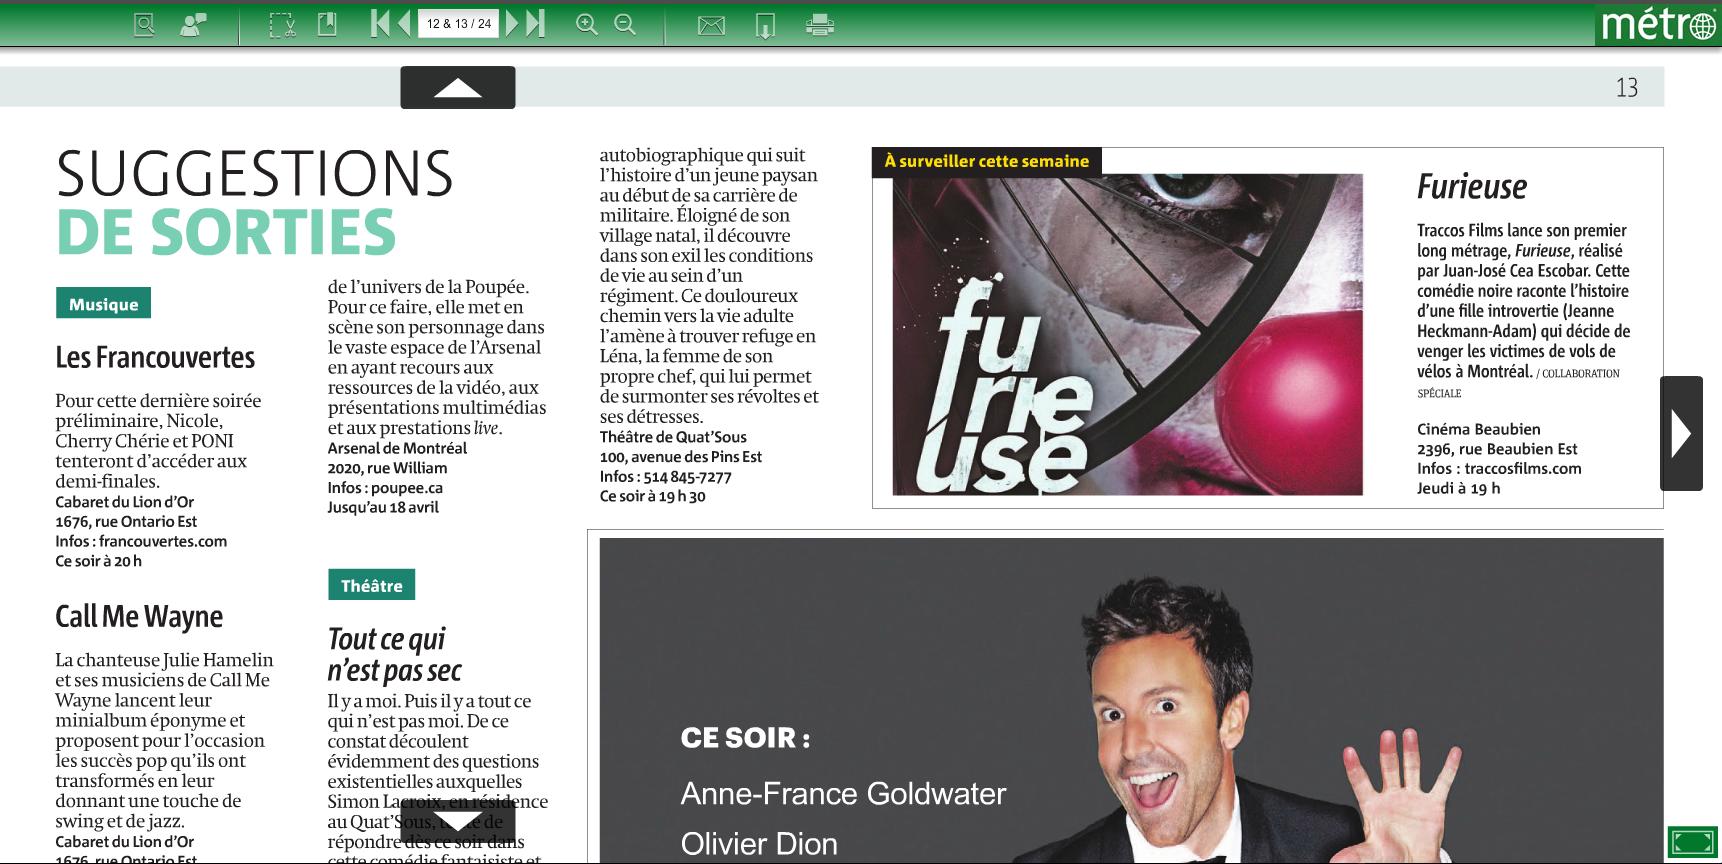 FURIEUSE | Journal Métro de Montreal